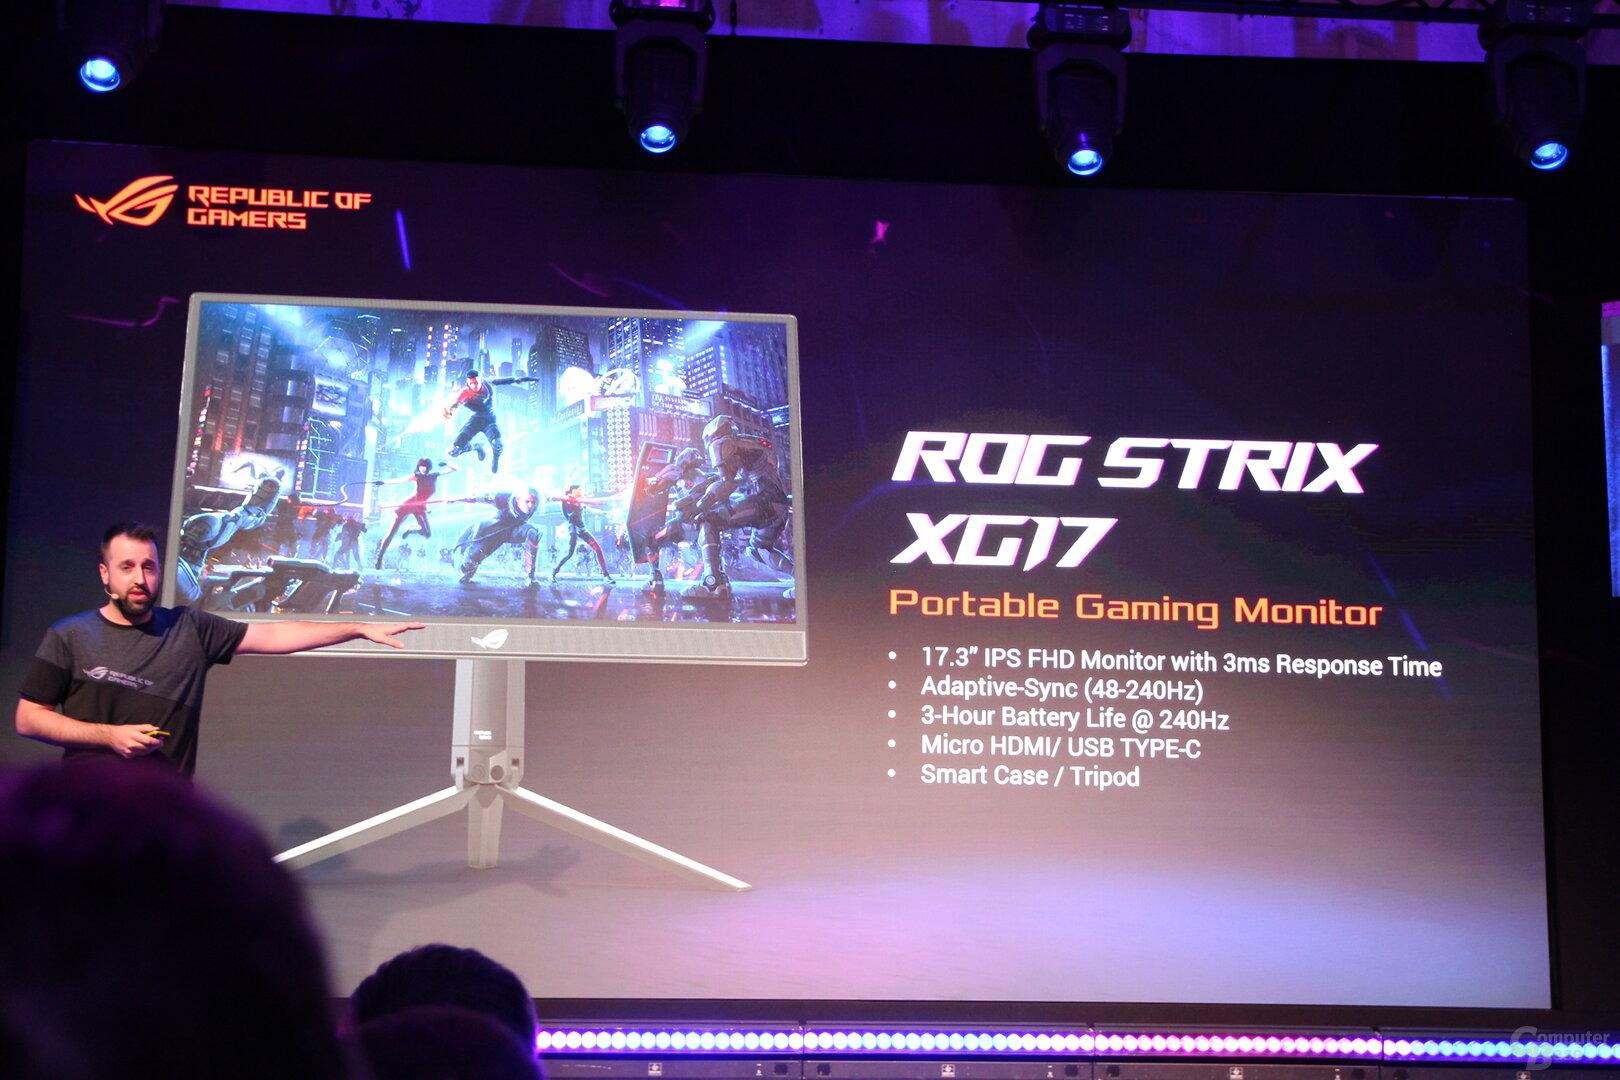 Asus ROG Strix XG17